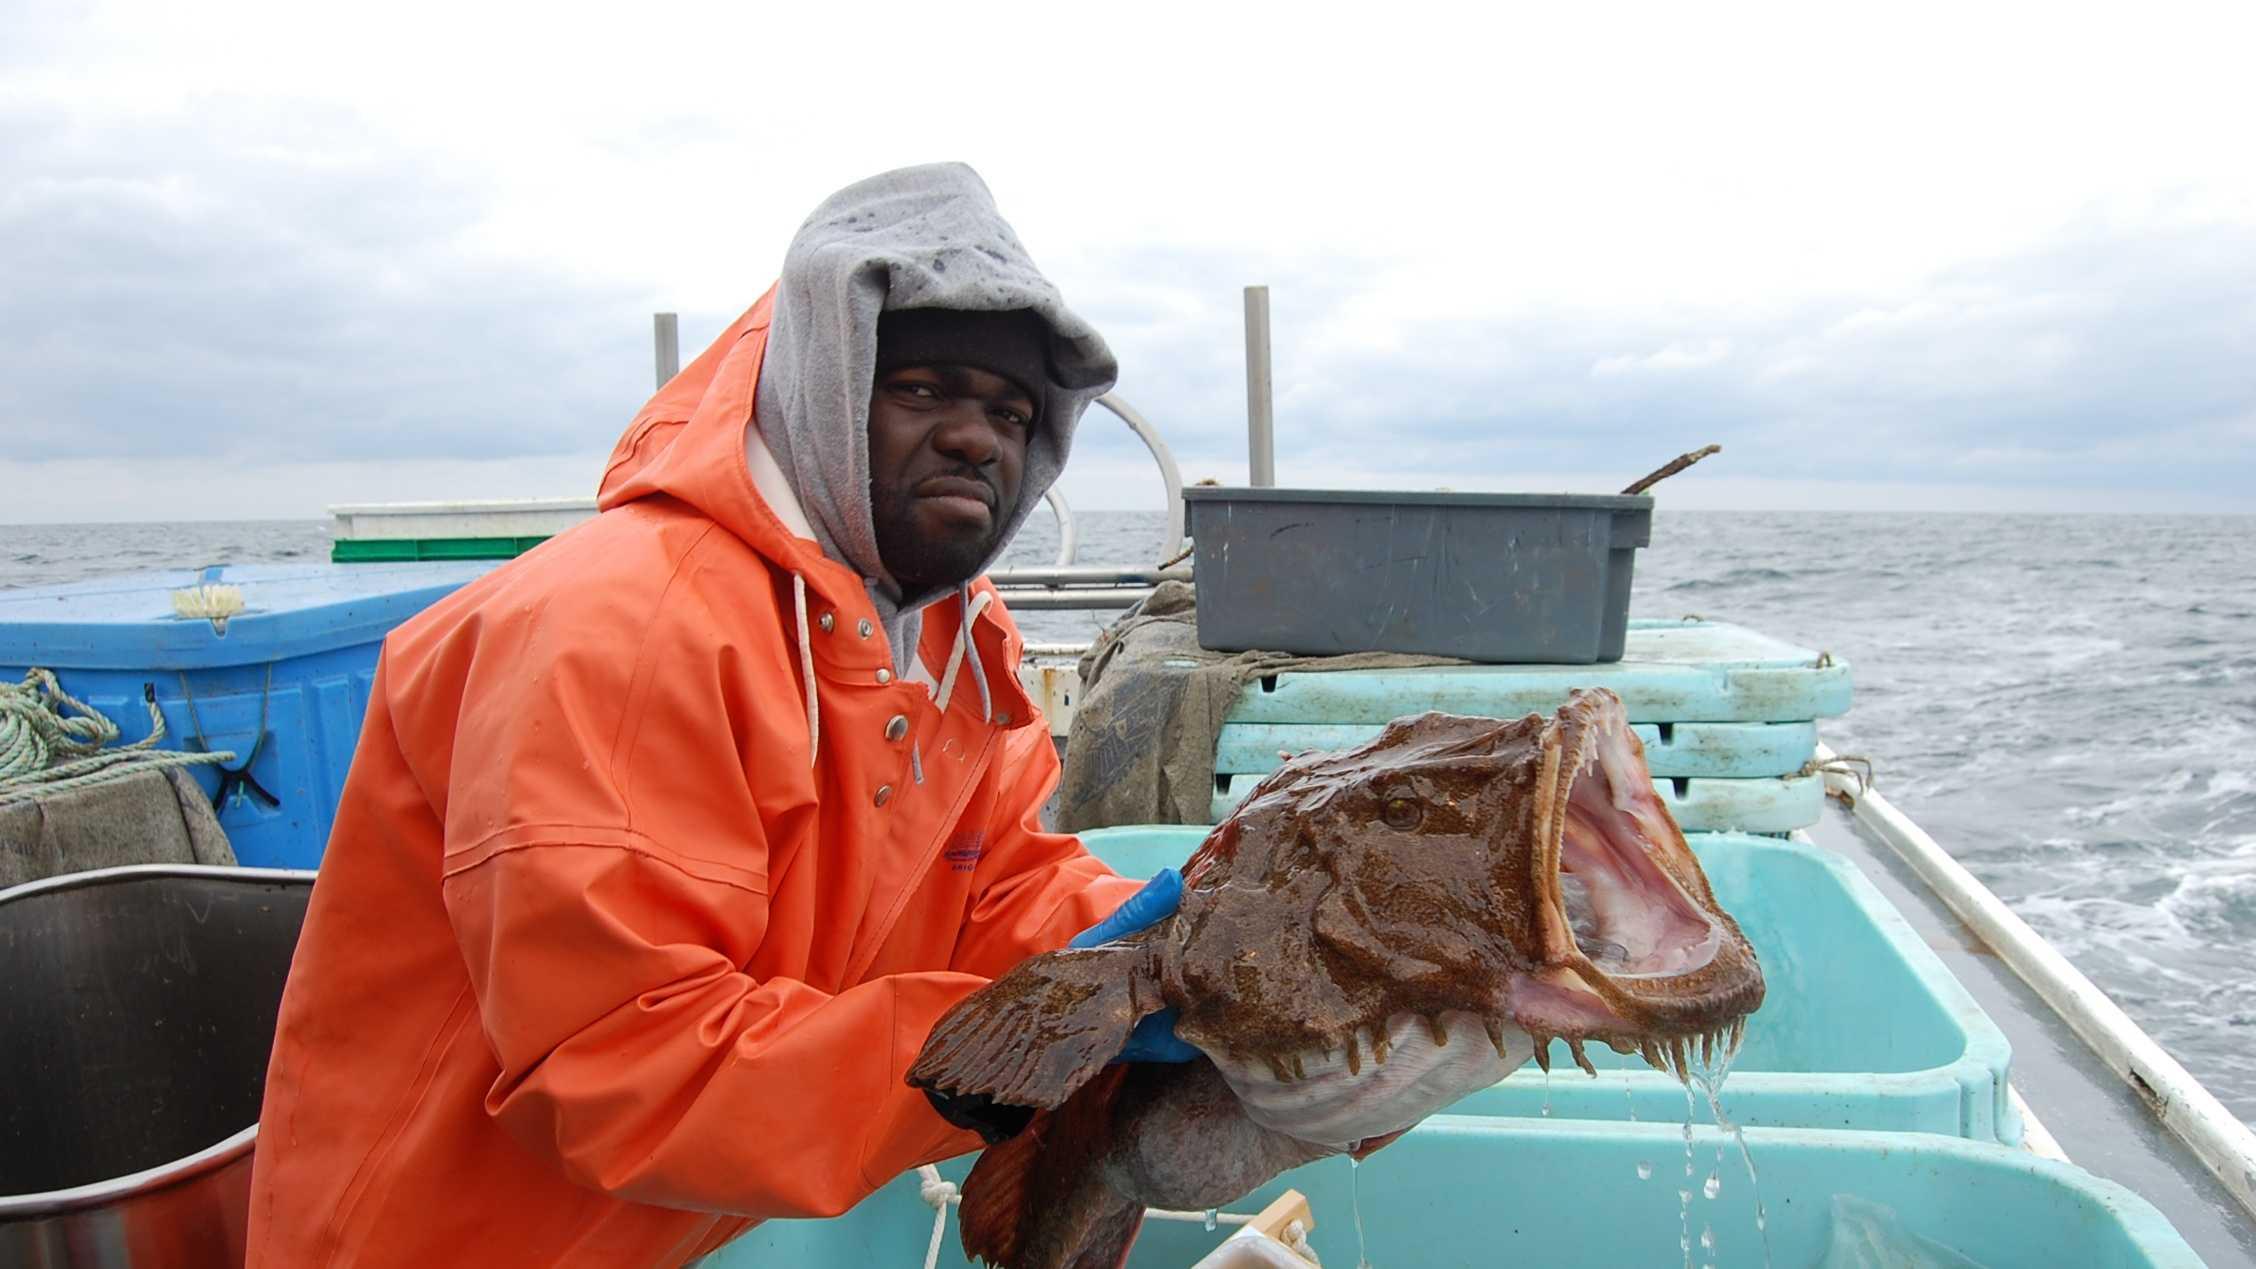 Monkfish blurb